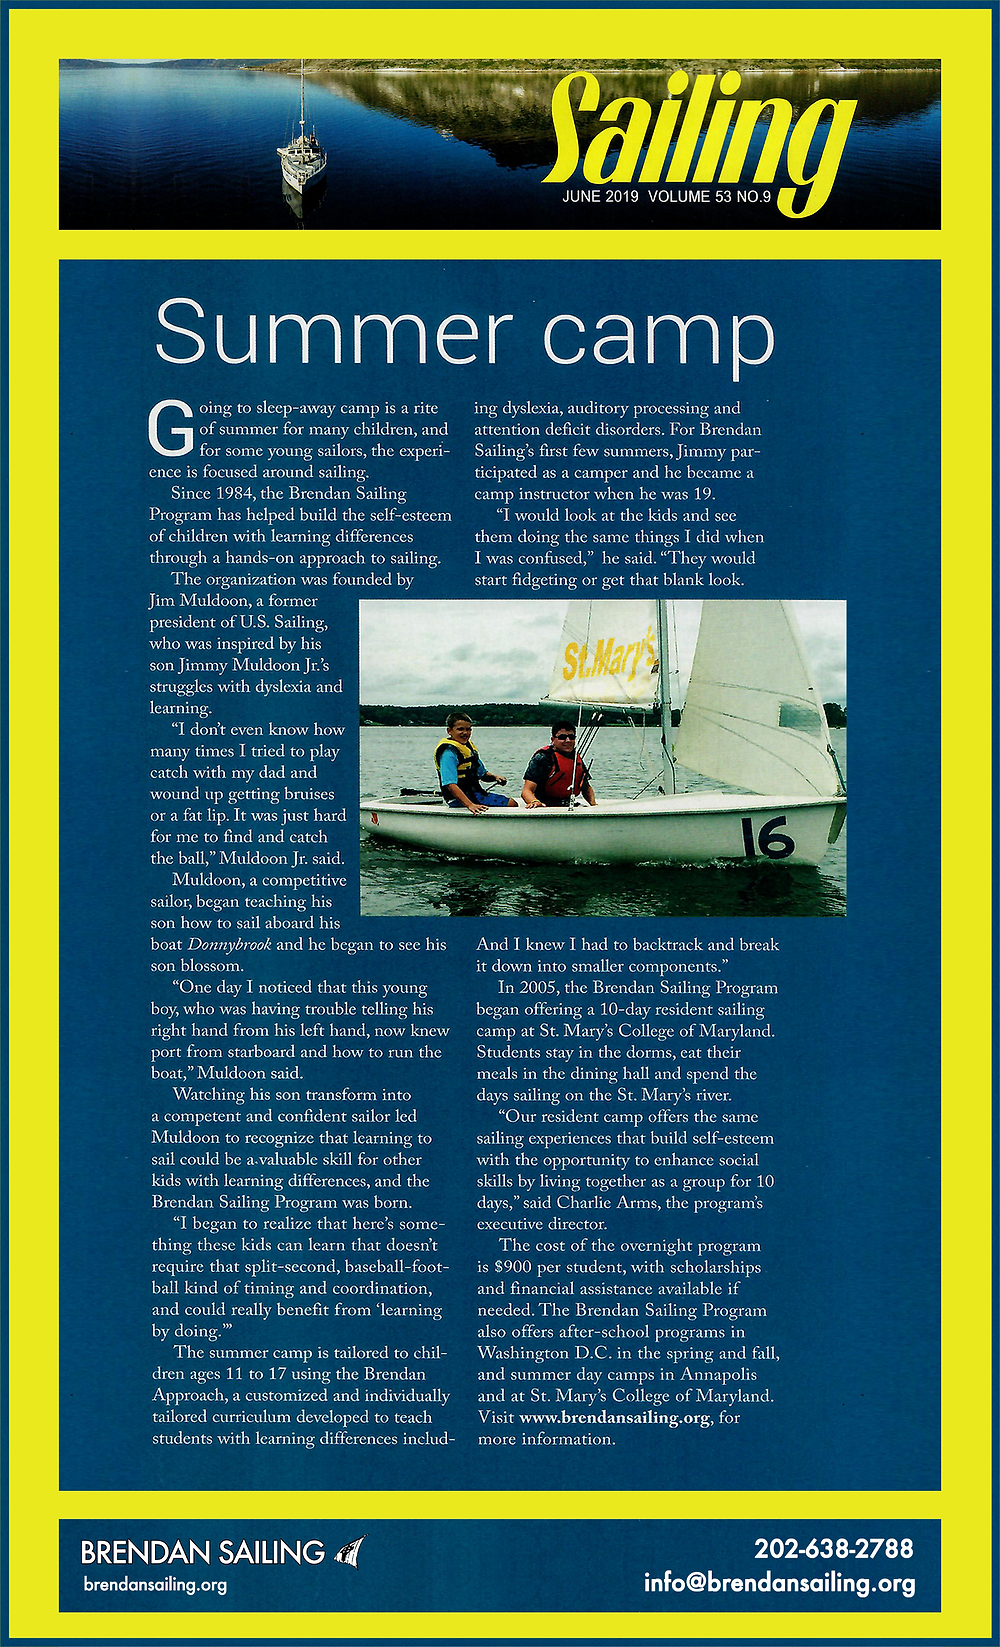 Brendan Sailing Feature in Sailing Magazine June 2019 Issue